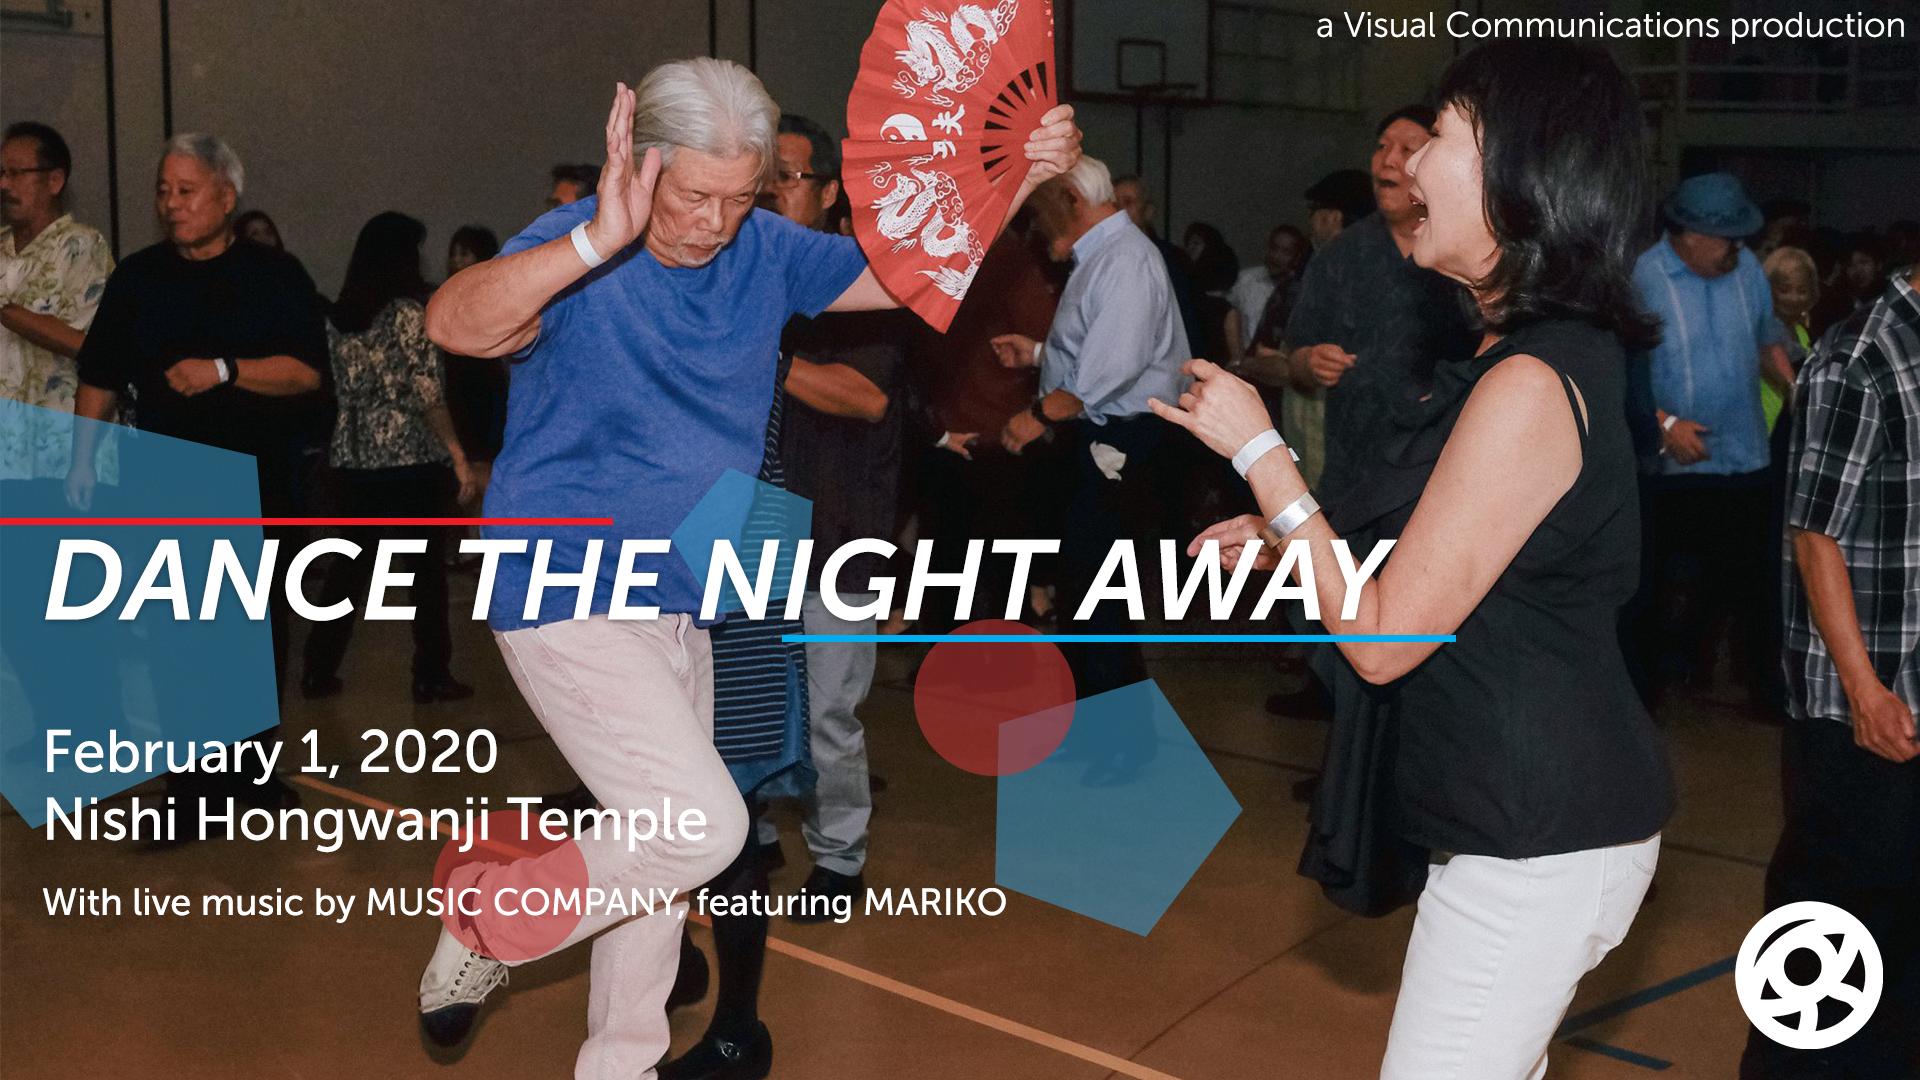 Away night dance the